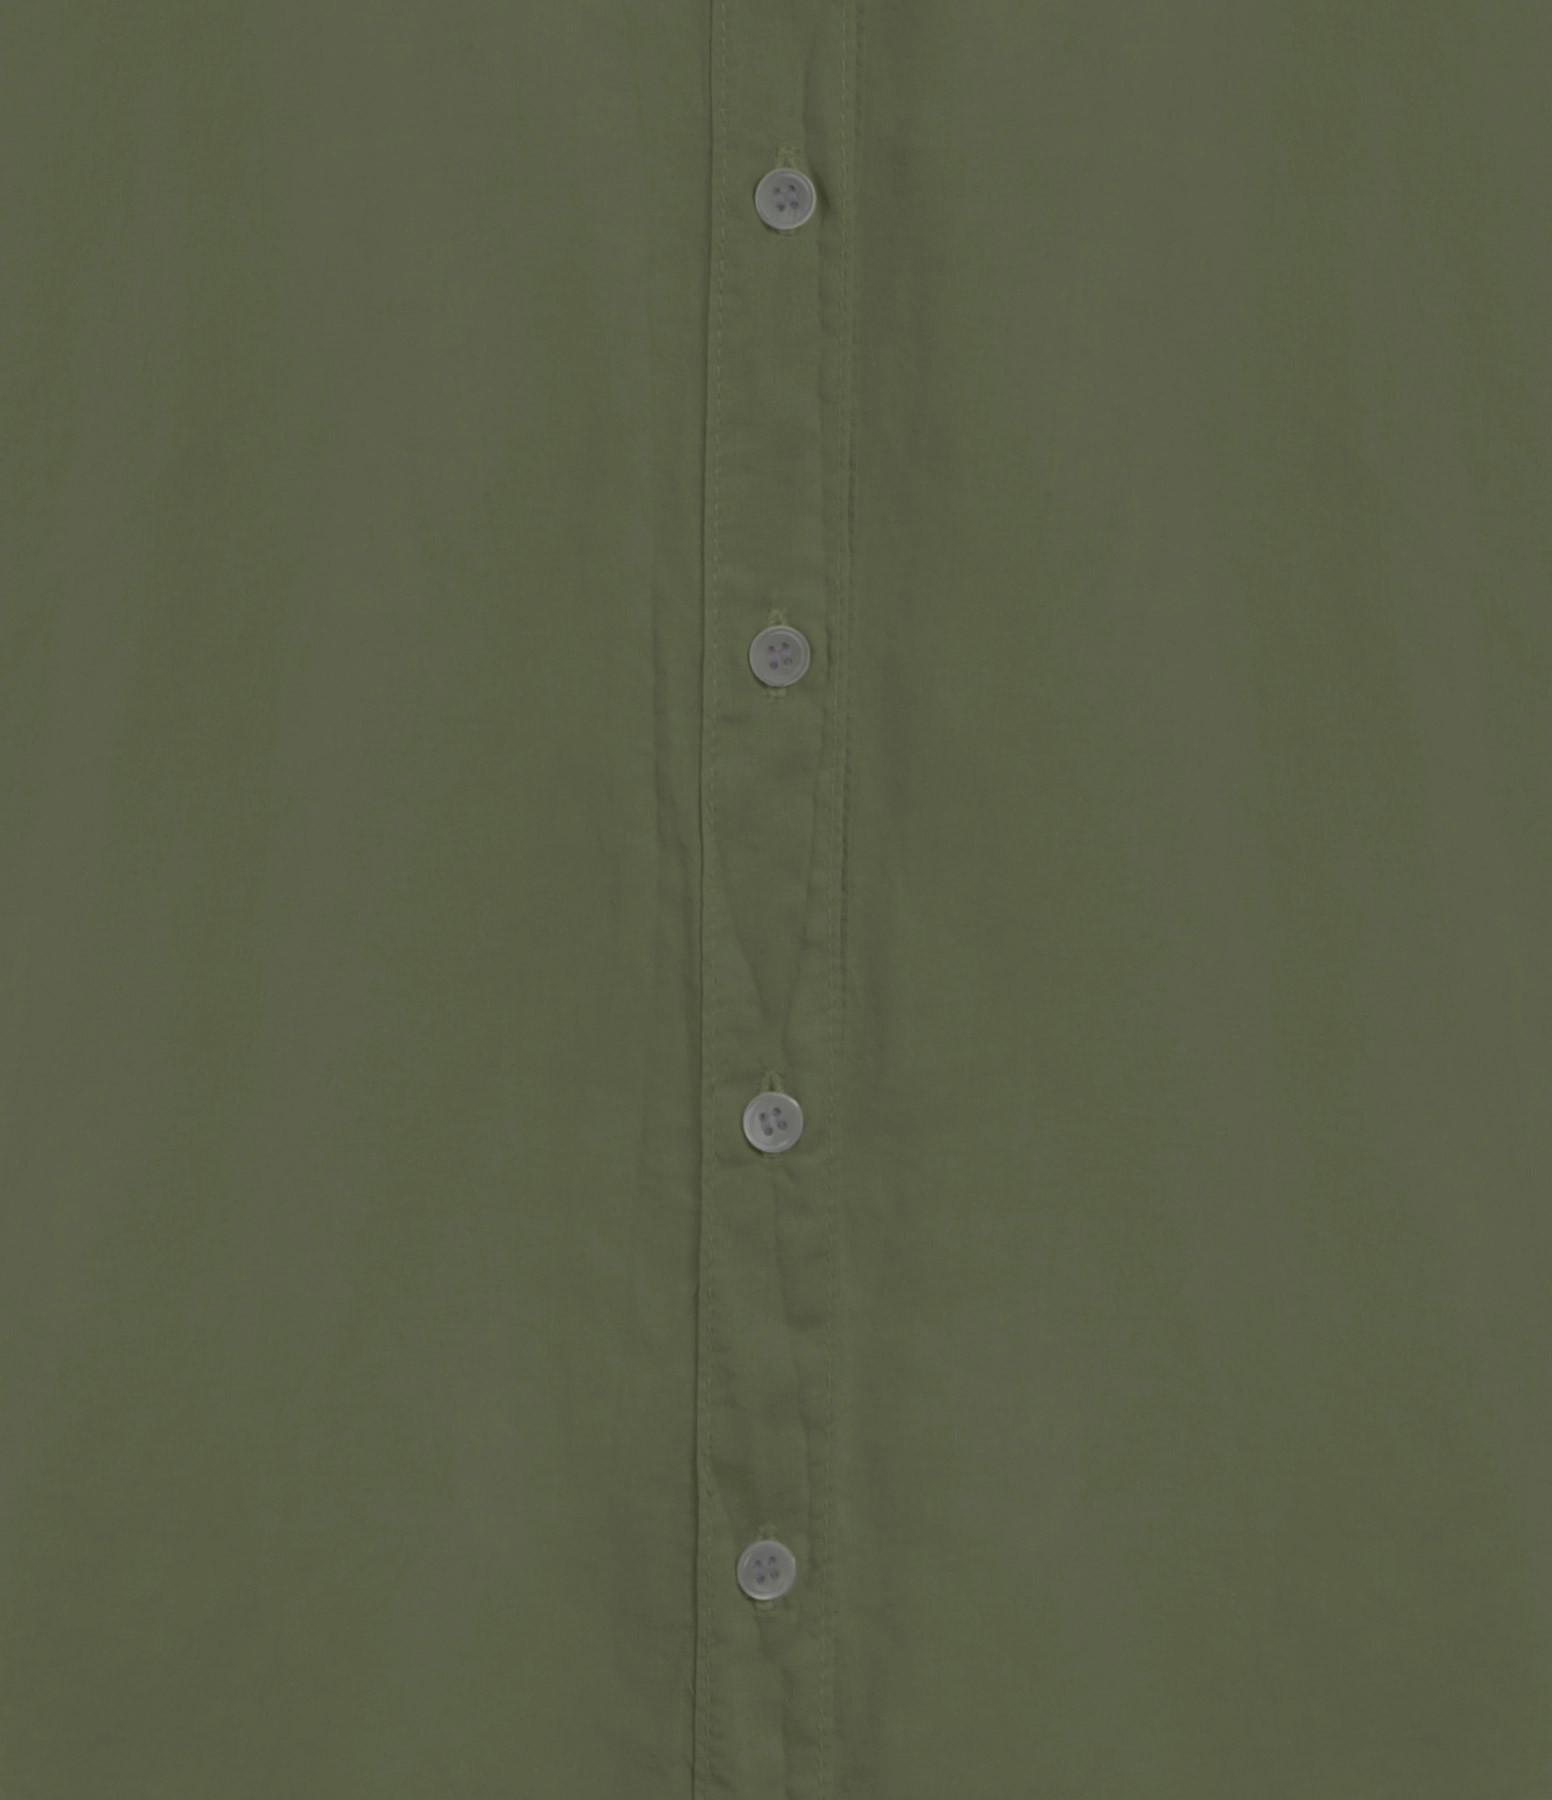 XIRENA - Chemise Beau Vert Olive